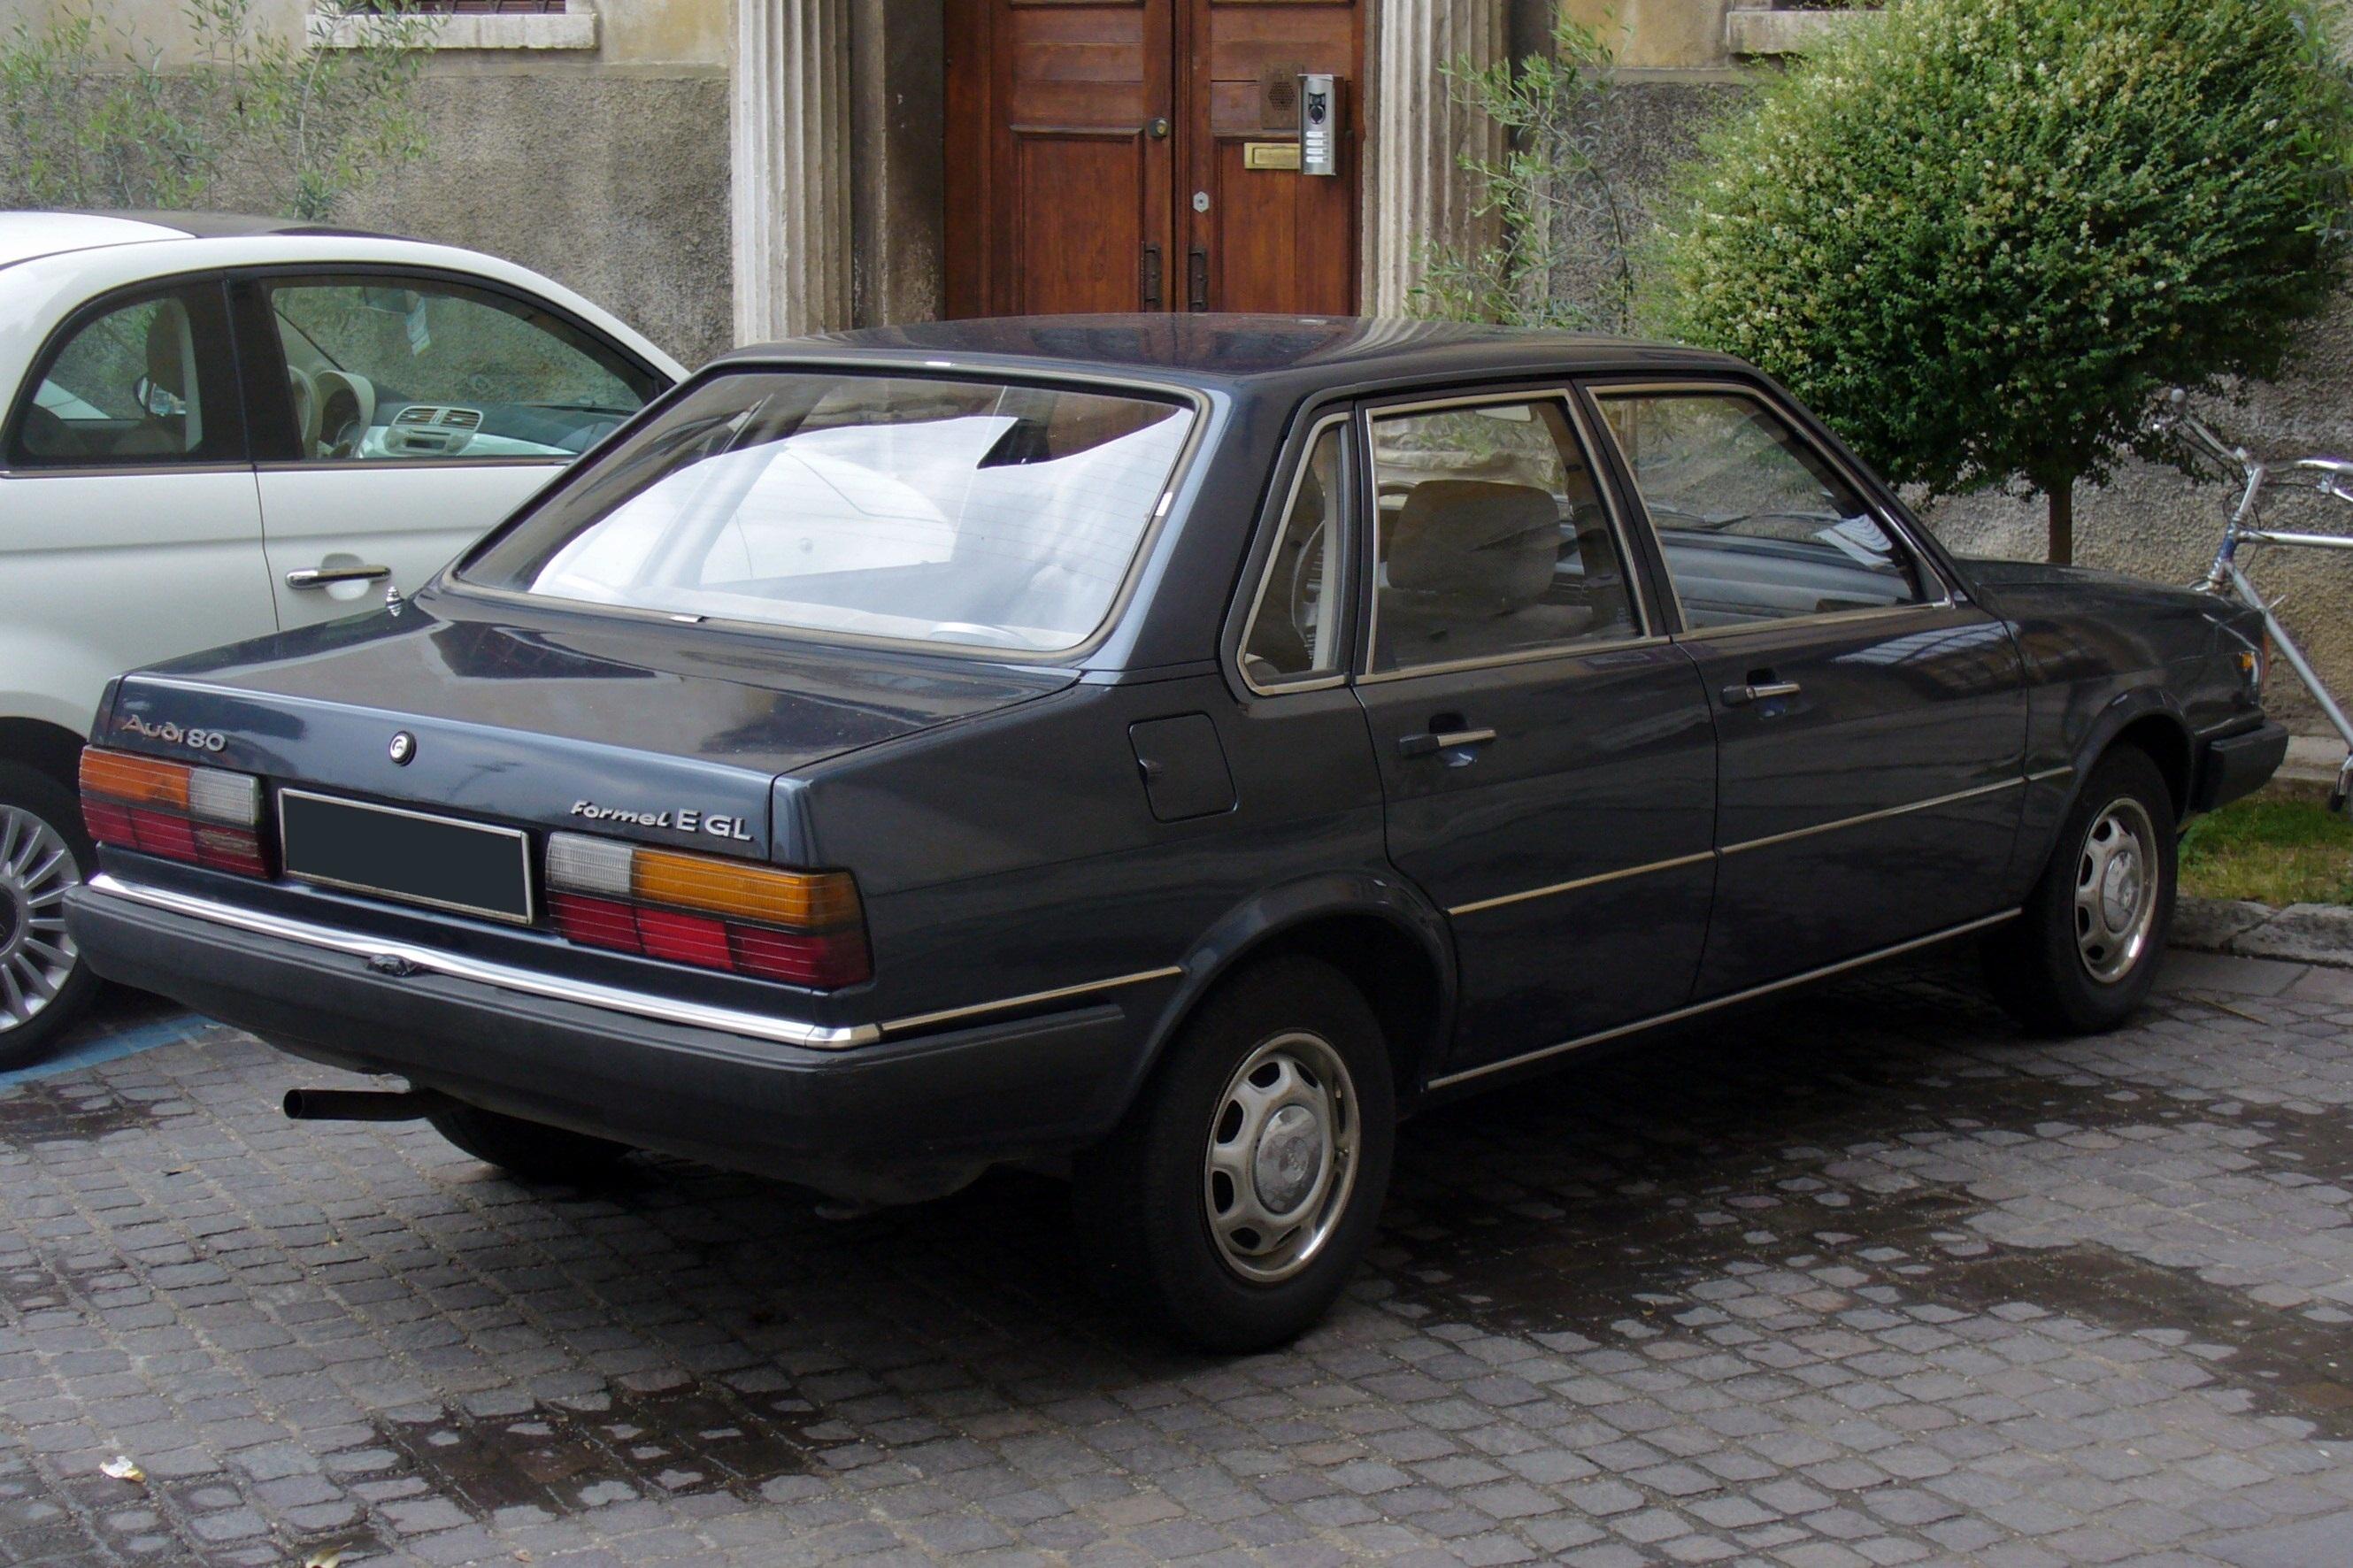 Datei Audi 80 Formel E Gl Heck Jpg Wikipedia